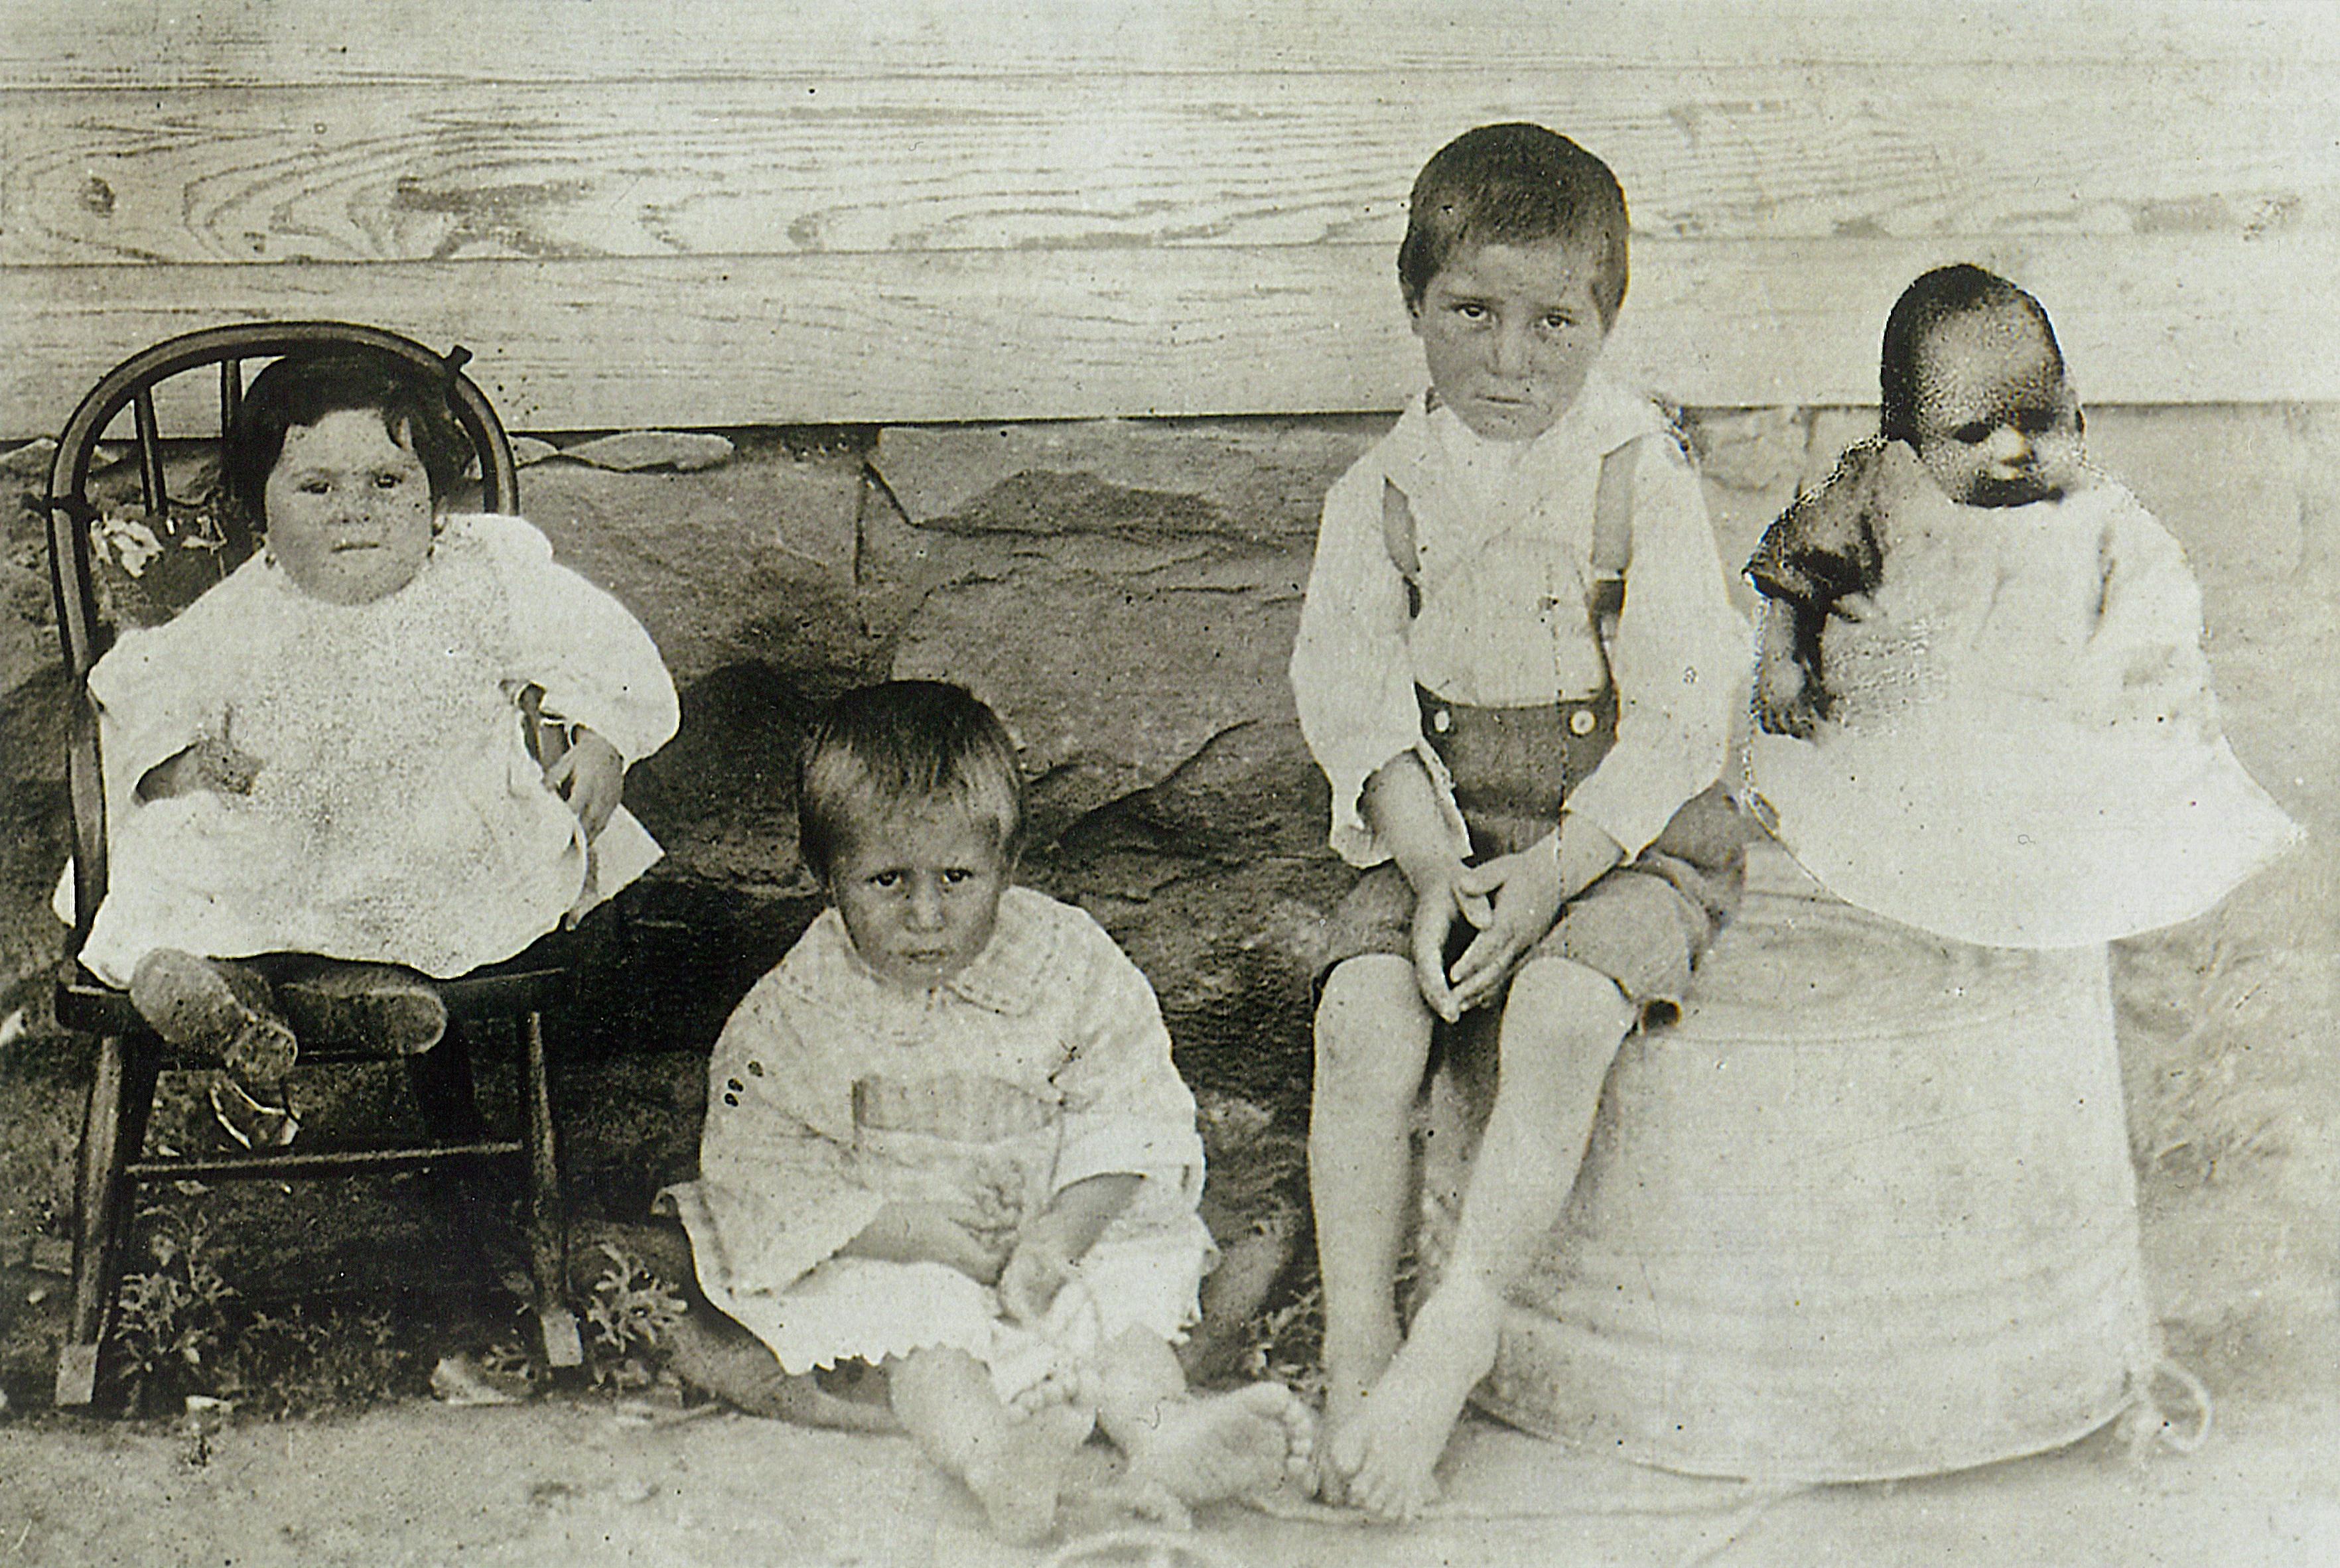 Photo: Ludlow Petrucci Children